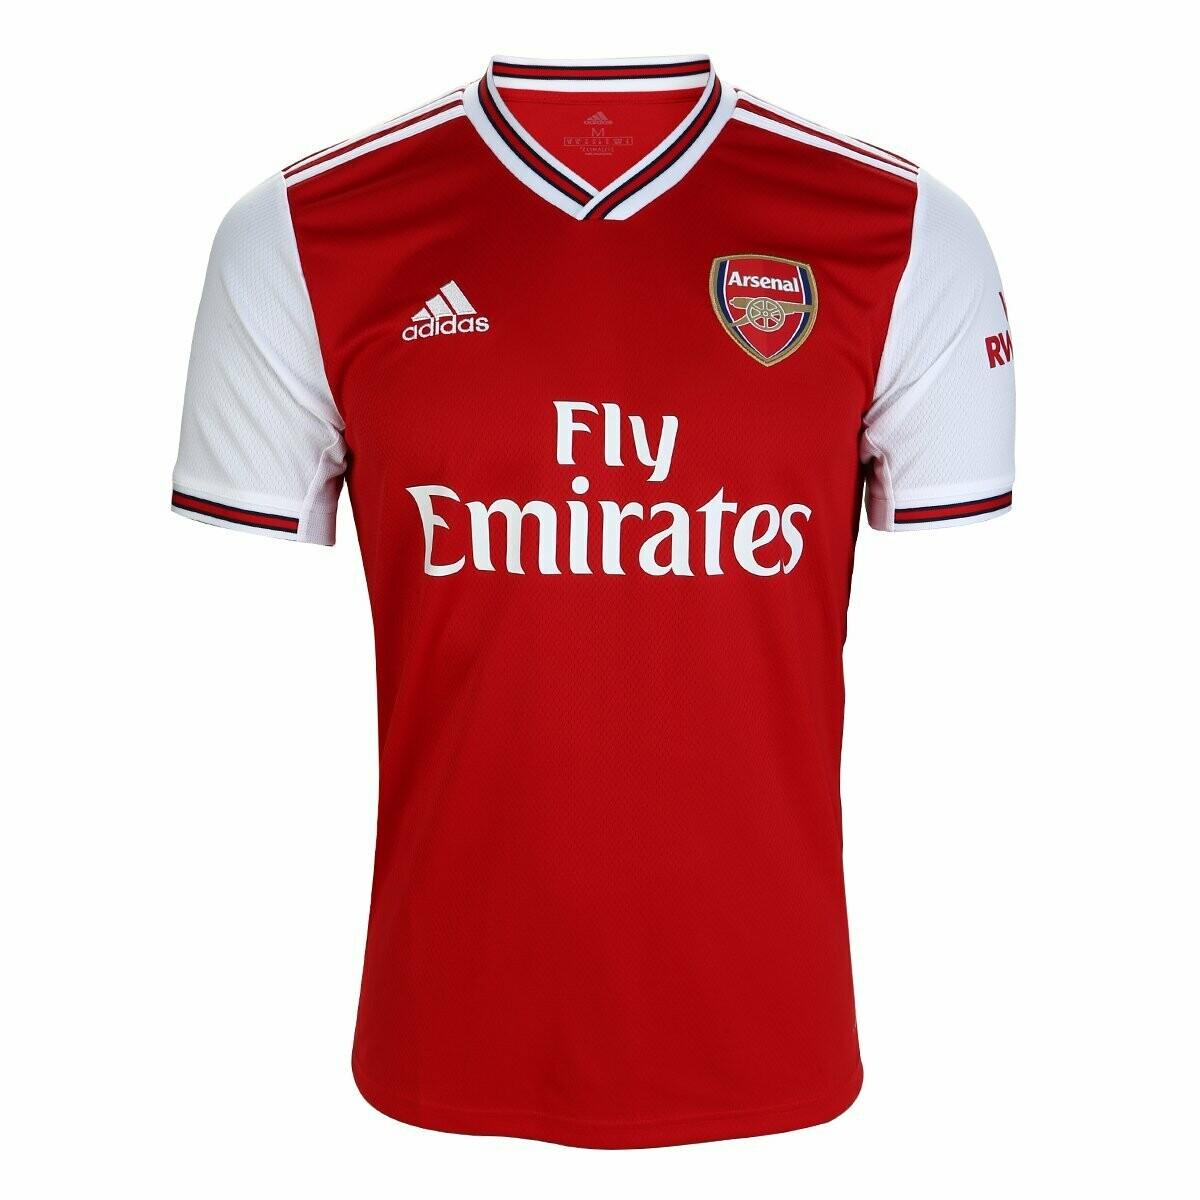 Camisa Arsenal 2019-2020 Adidas Home